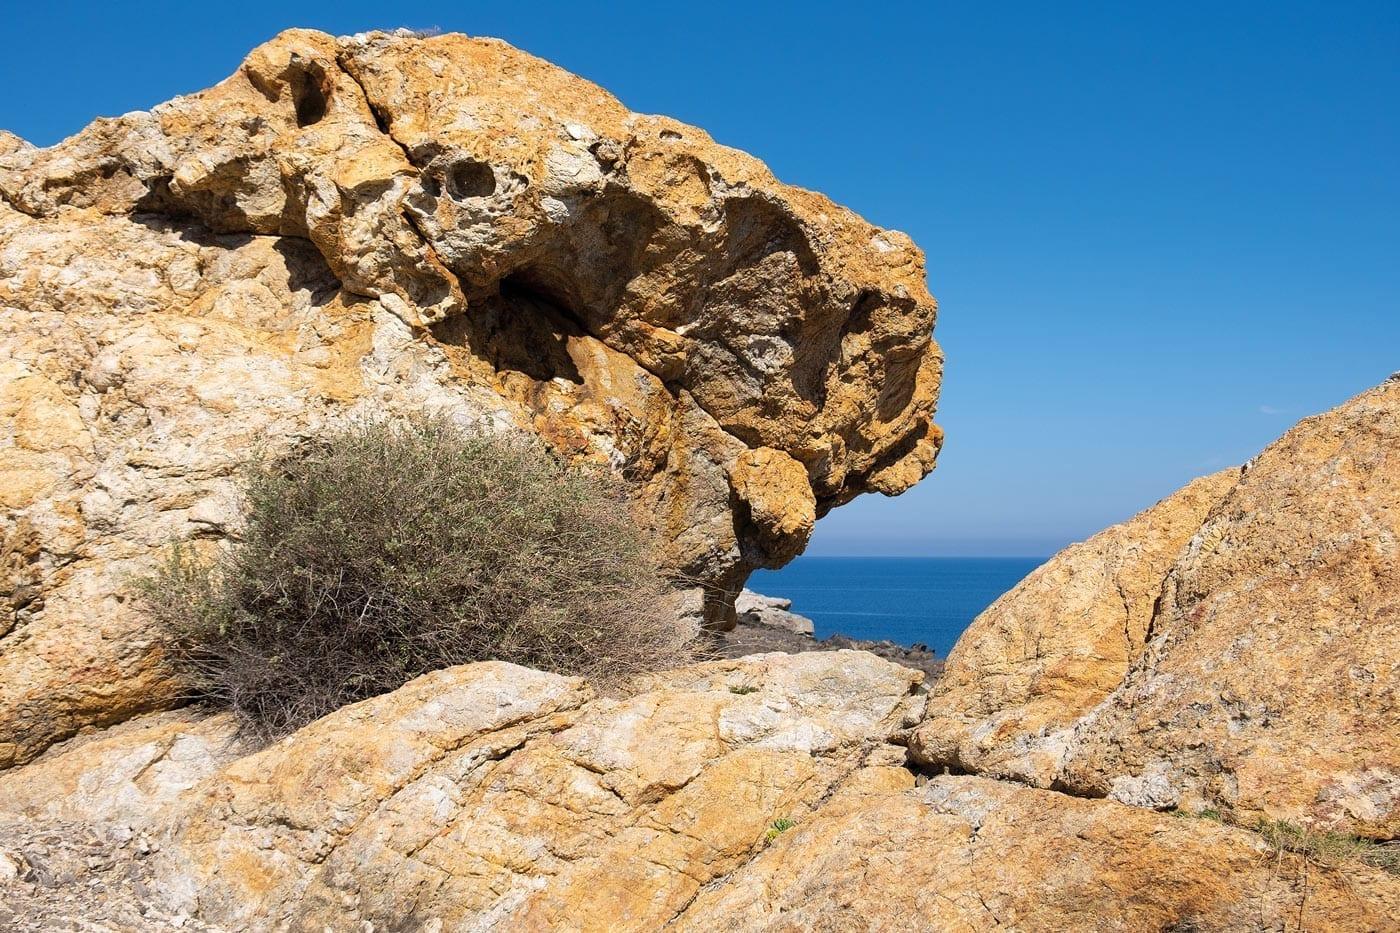 Pla de Tuleda, Salvador Dalí, Cap de Creus, Costa Brava, Mittelmeer